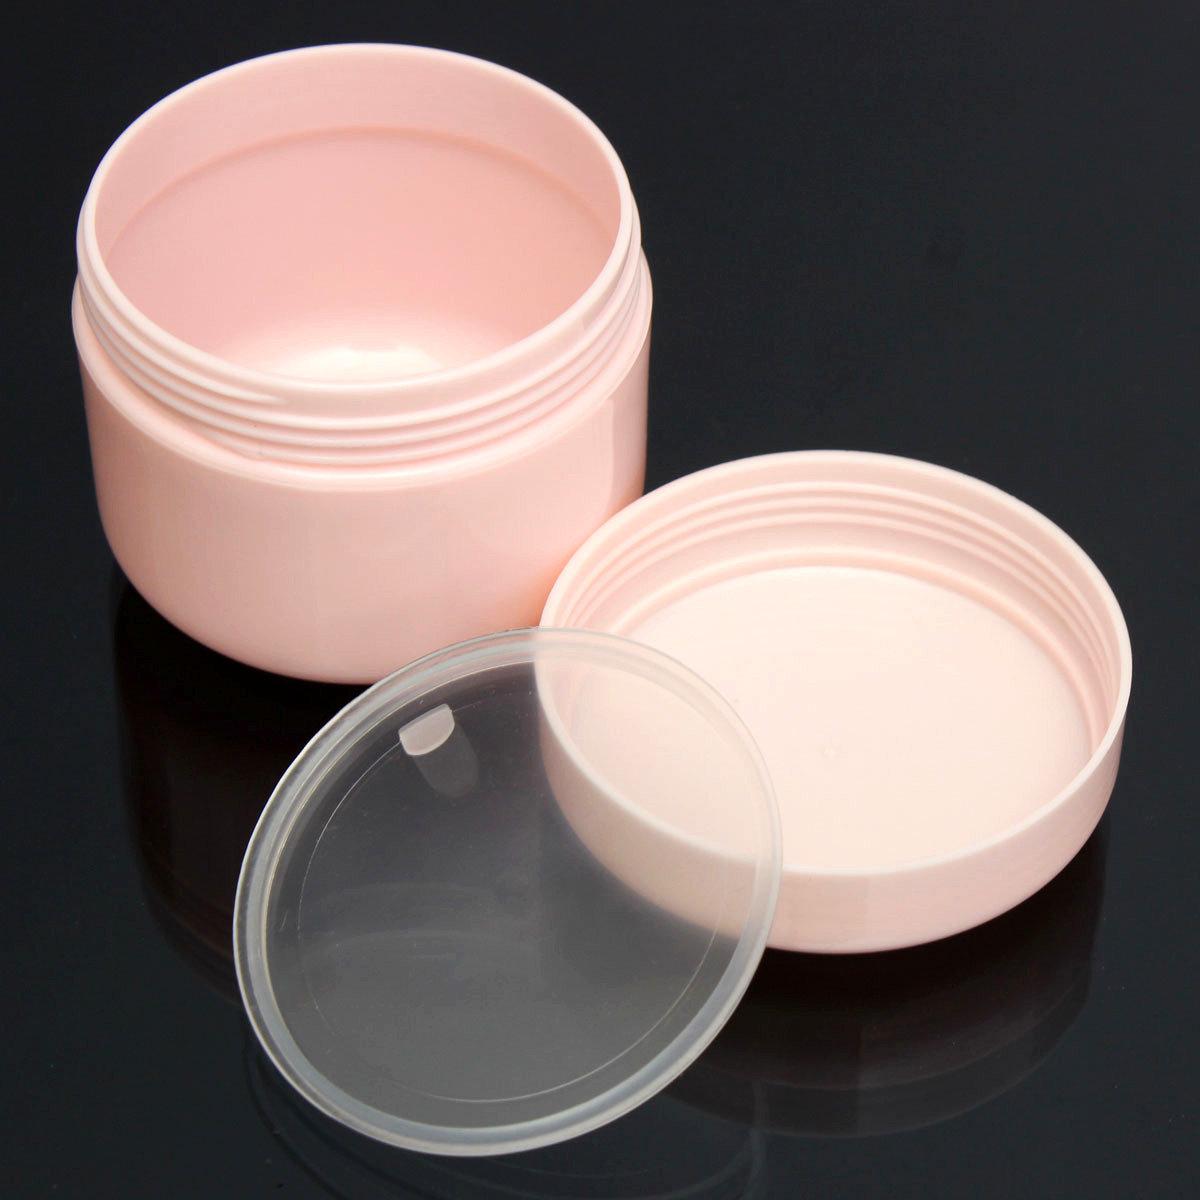 50ml Empty Facial Cream Container Lotion Pot Face Makeup Travel Pink